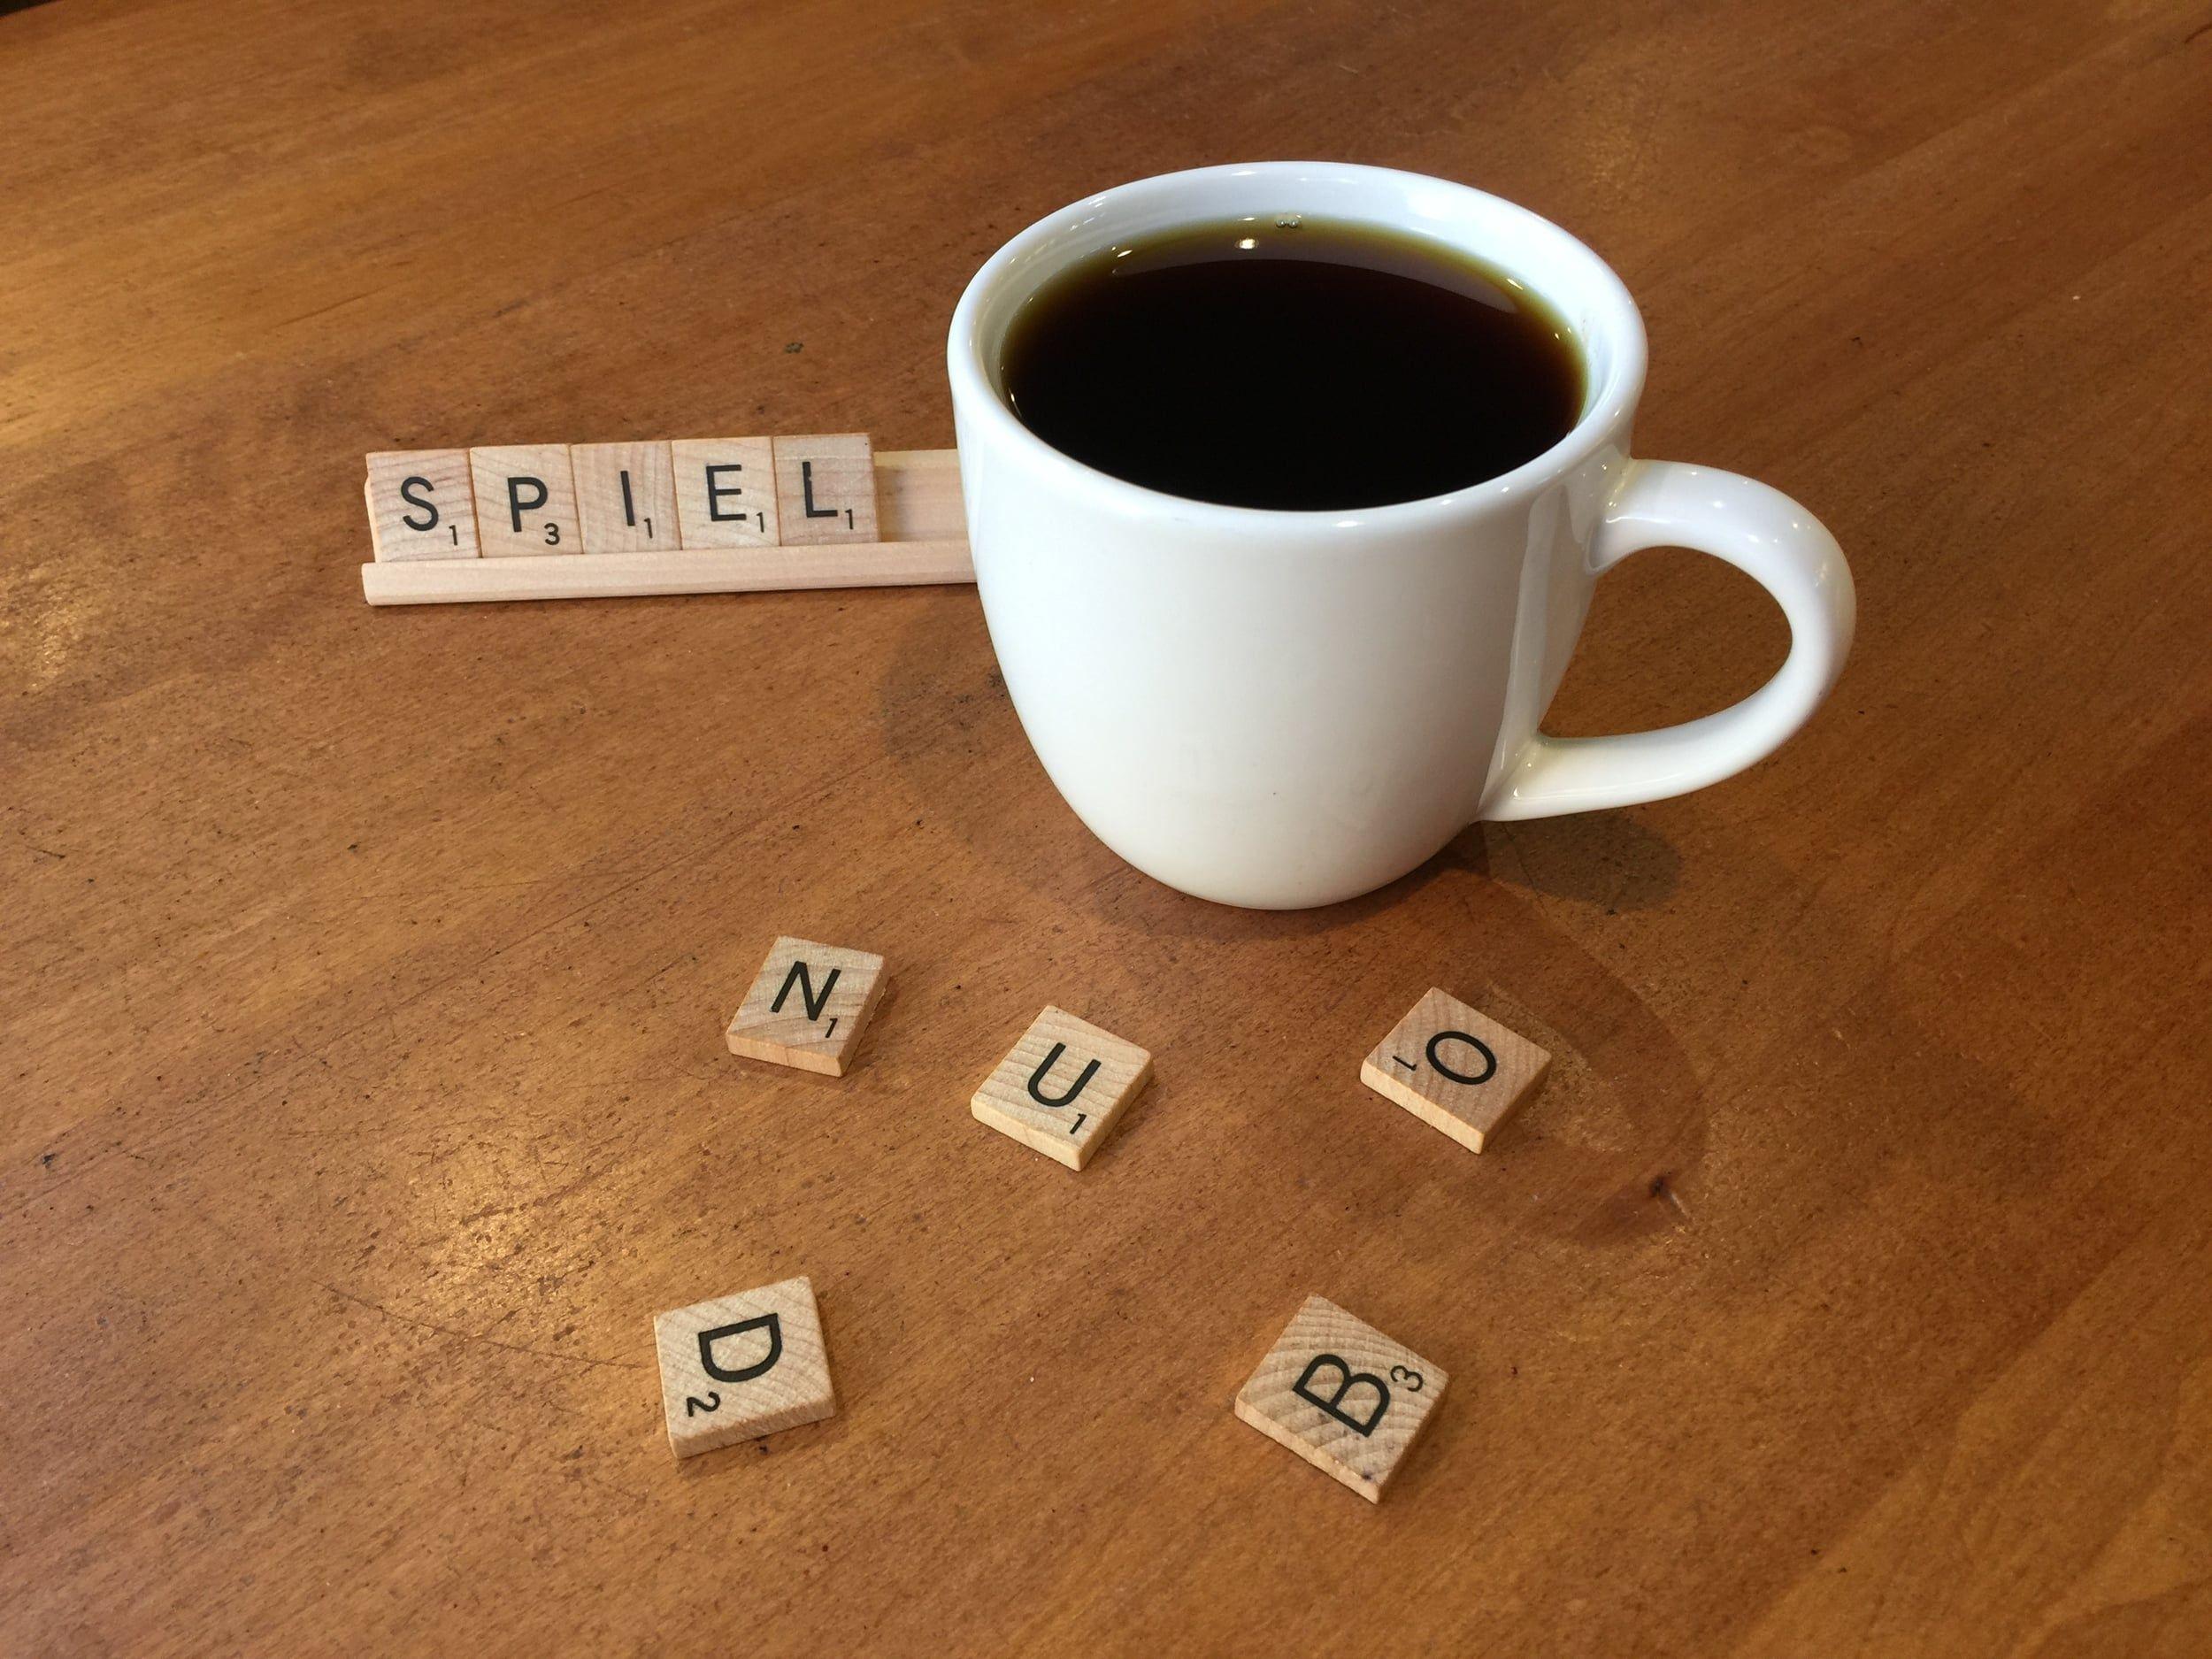 Spielbound Board game Cafe Board game cafe, Game cafe